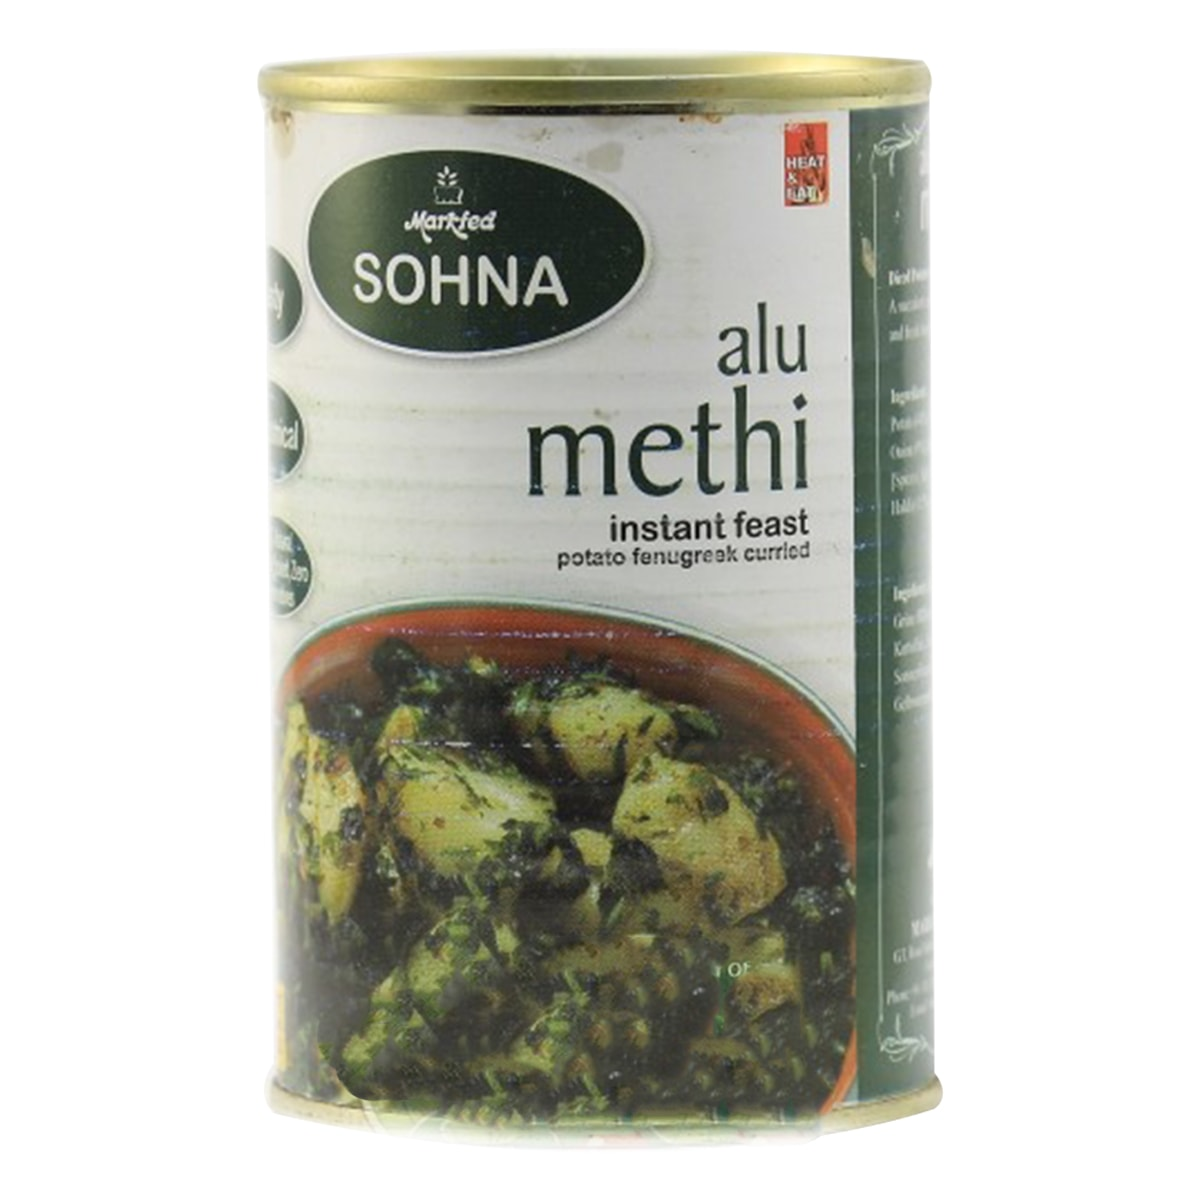 Buy Markfed Sohna Alu Methi (Potato Fenugreek Curried) - 450 gm